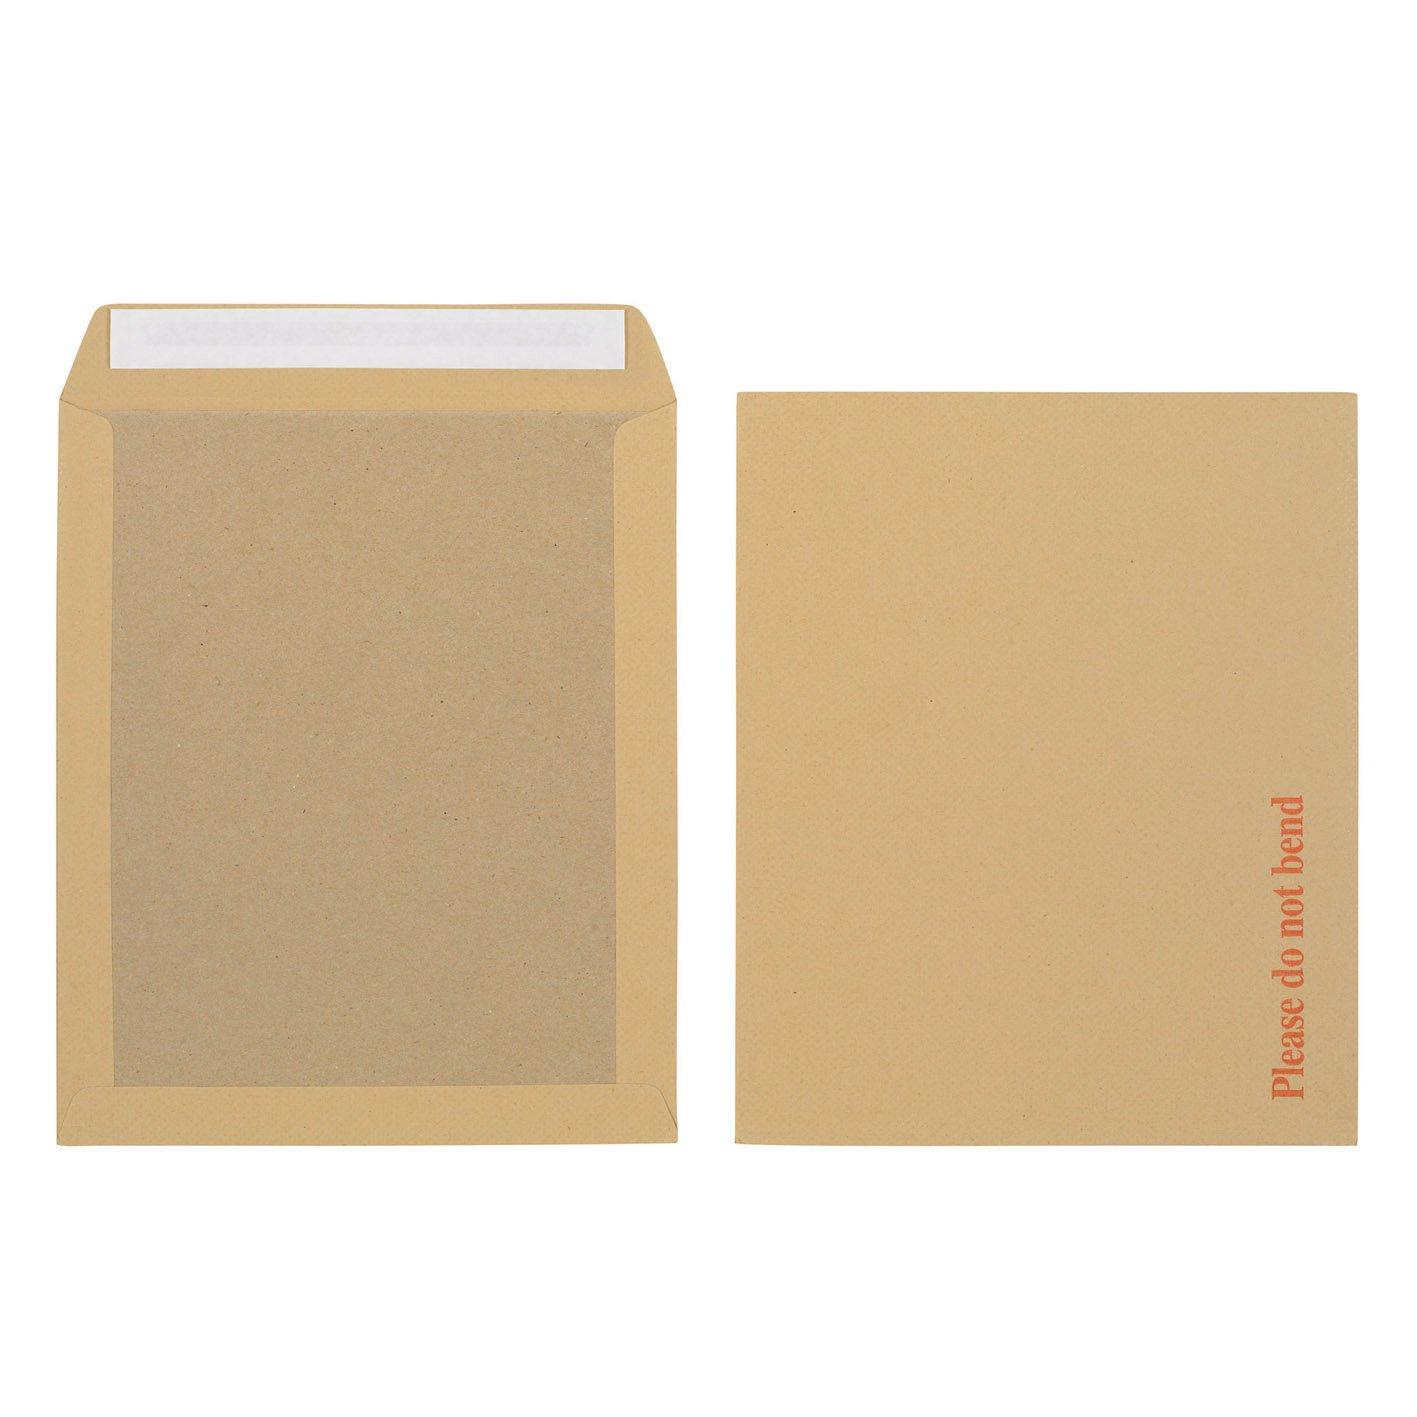 Initiative Envelope Boardbacked Peel & Seal 318 x 267mm 115gsm Manilla Pack 125